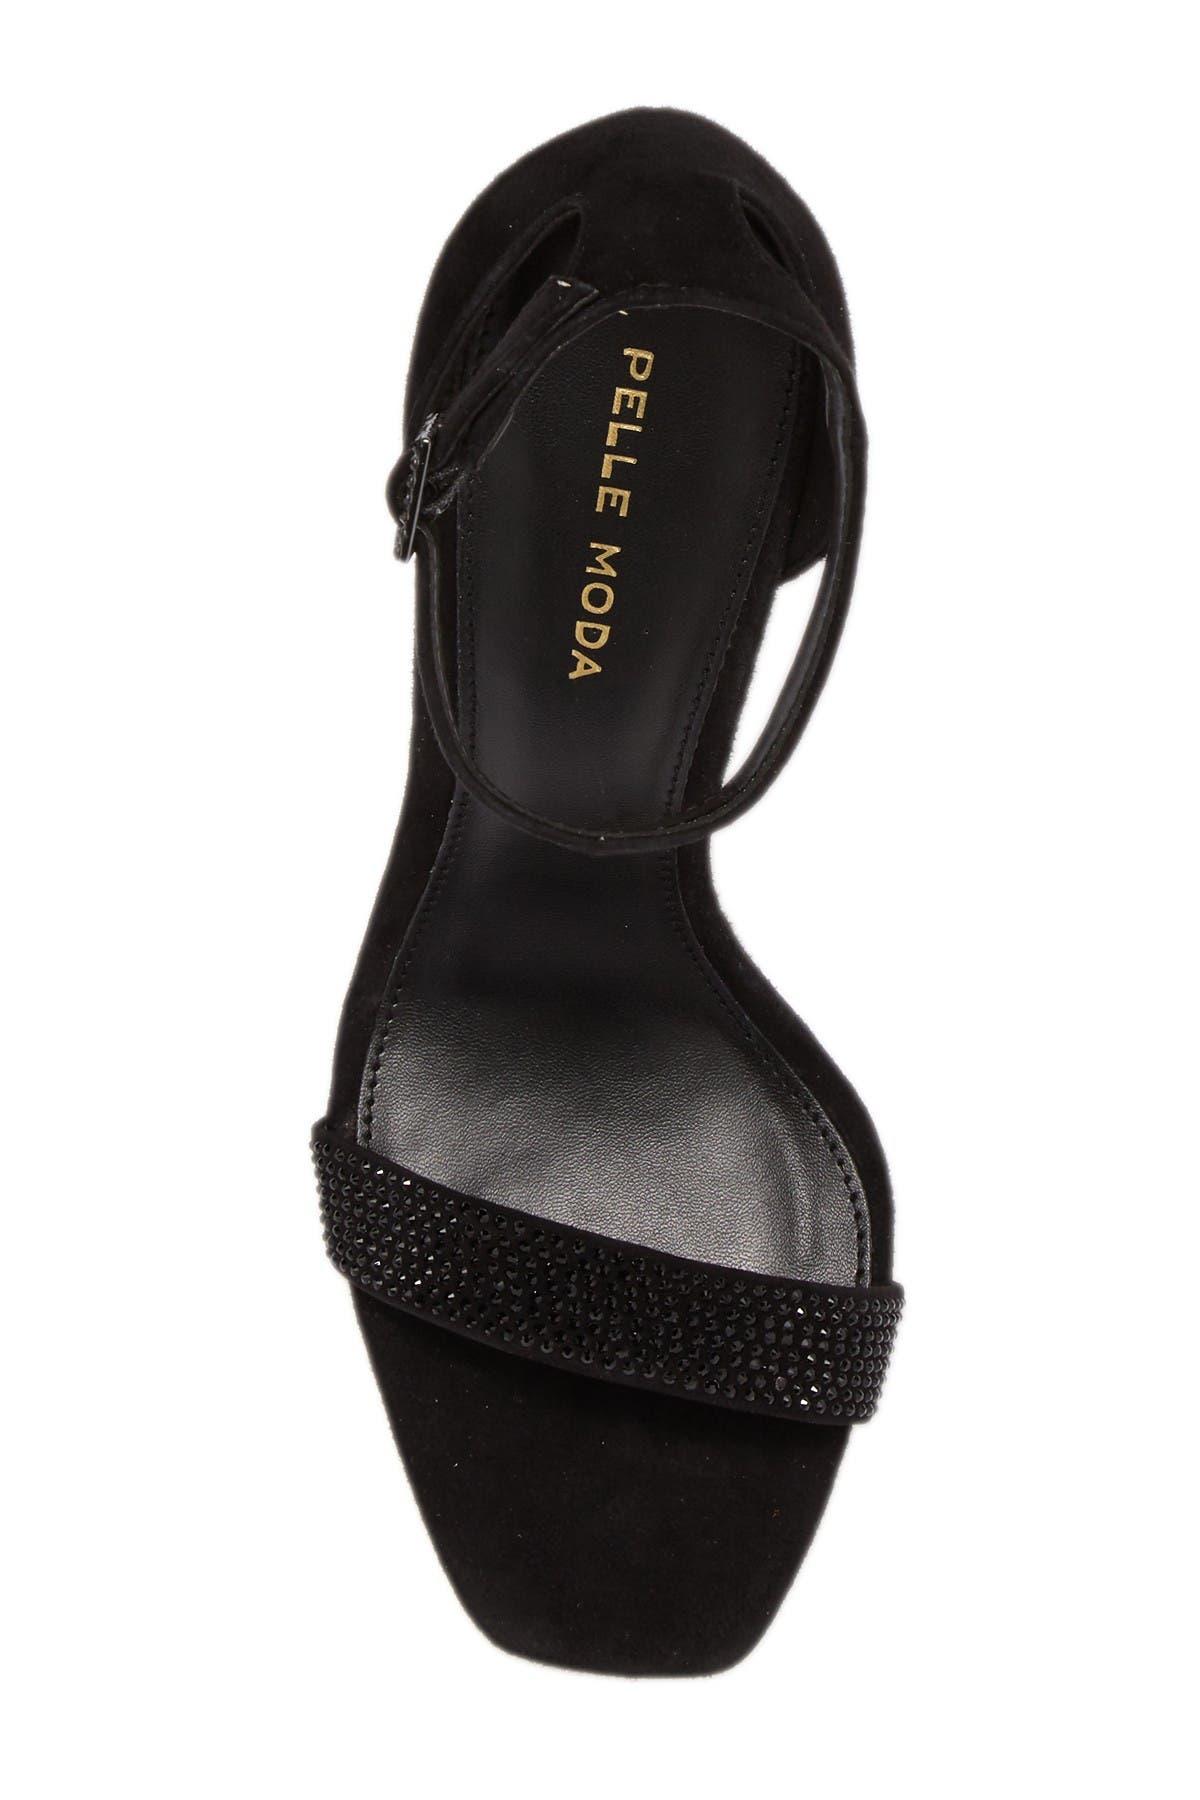 Image of Pelle Moda Gabi 3 Suede Ankle Strap Sandal